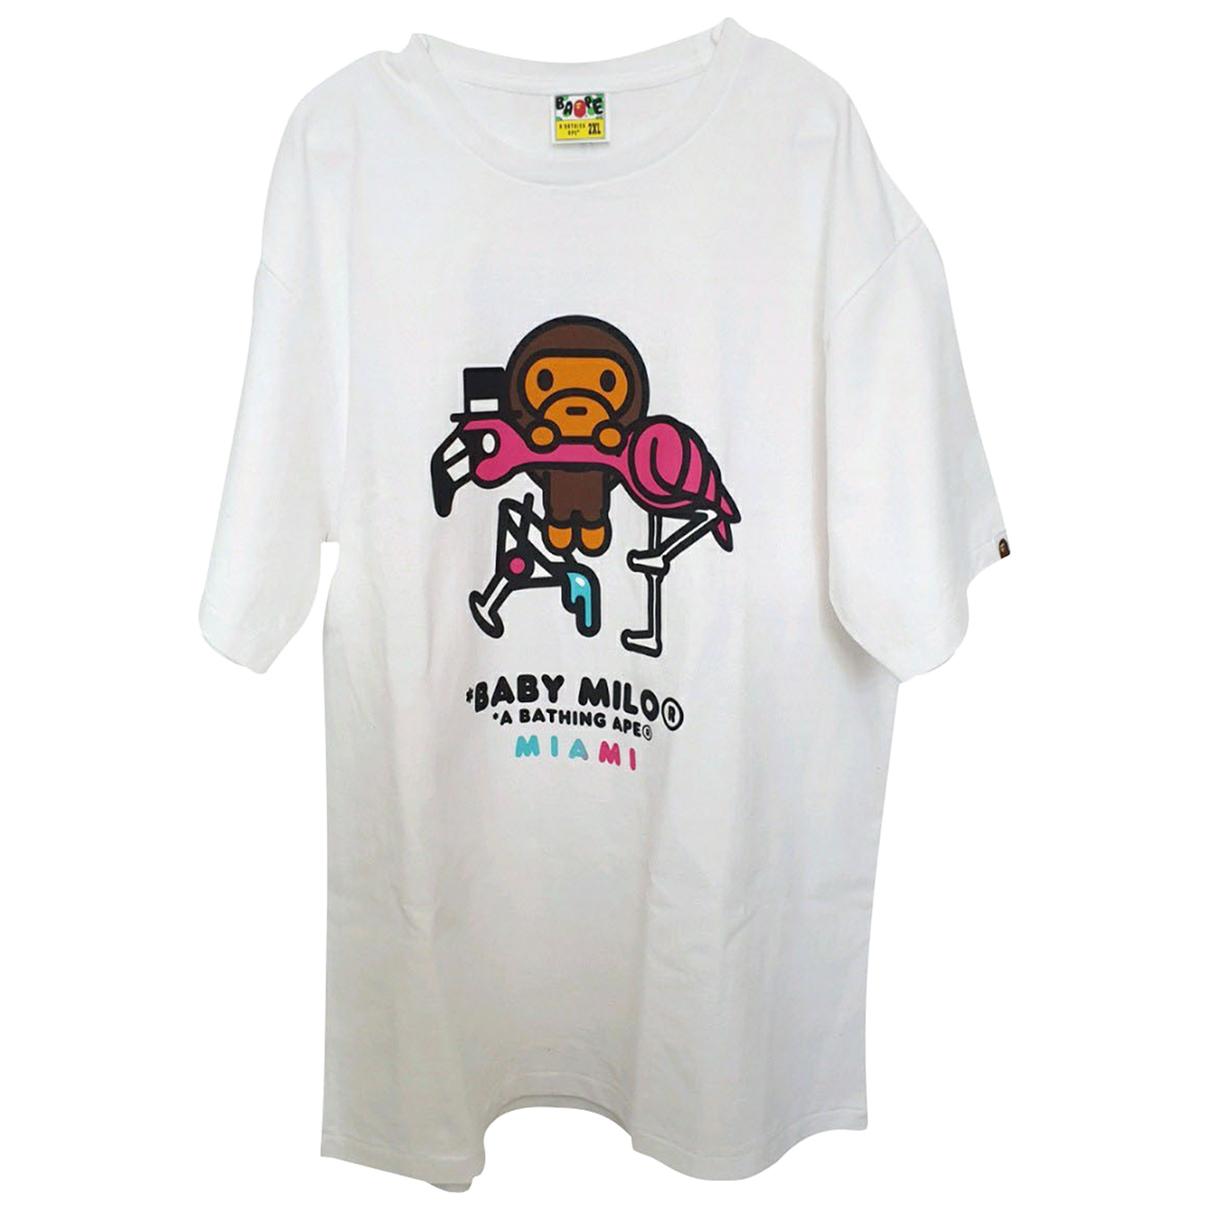 A Bathing Ape N White Cotton T-shirts for Men XXL International